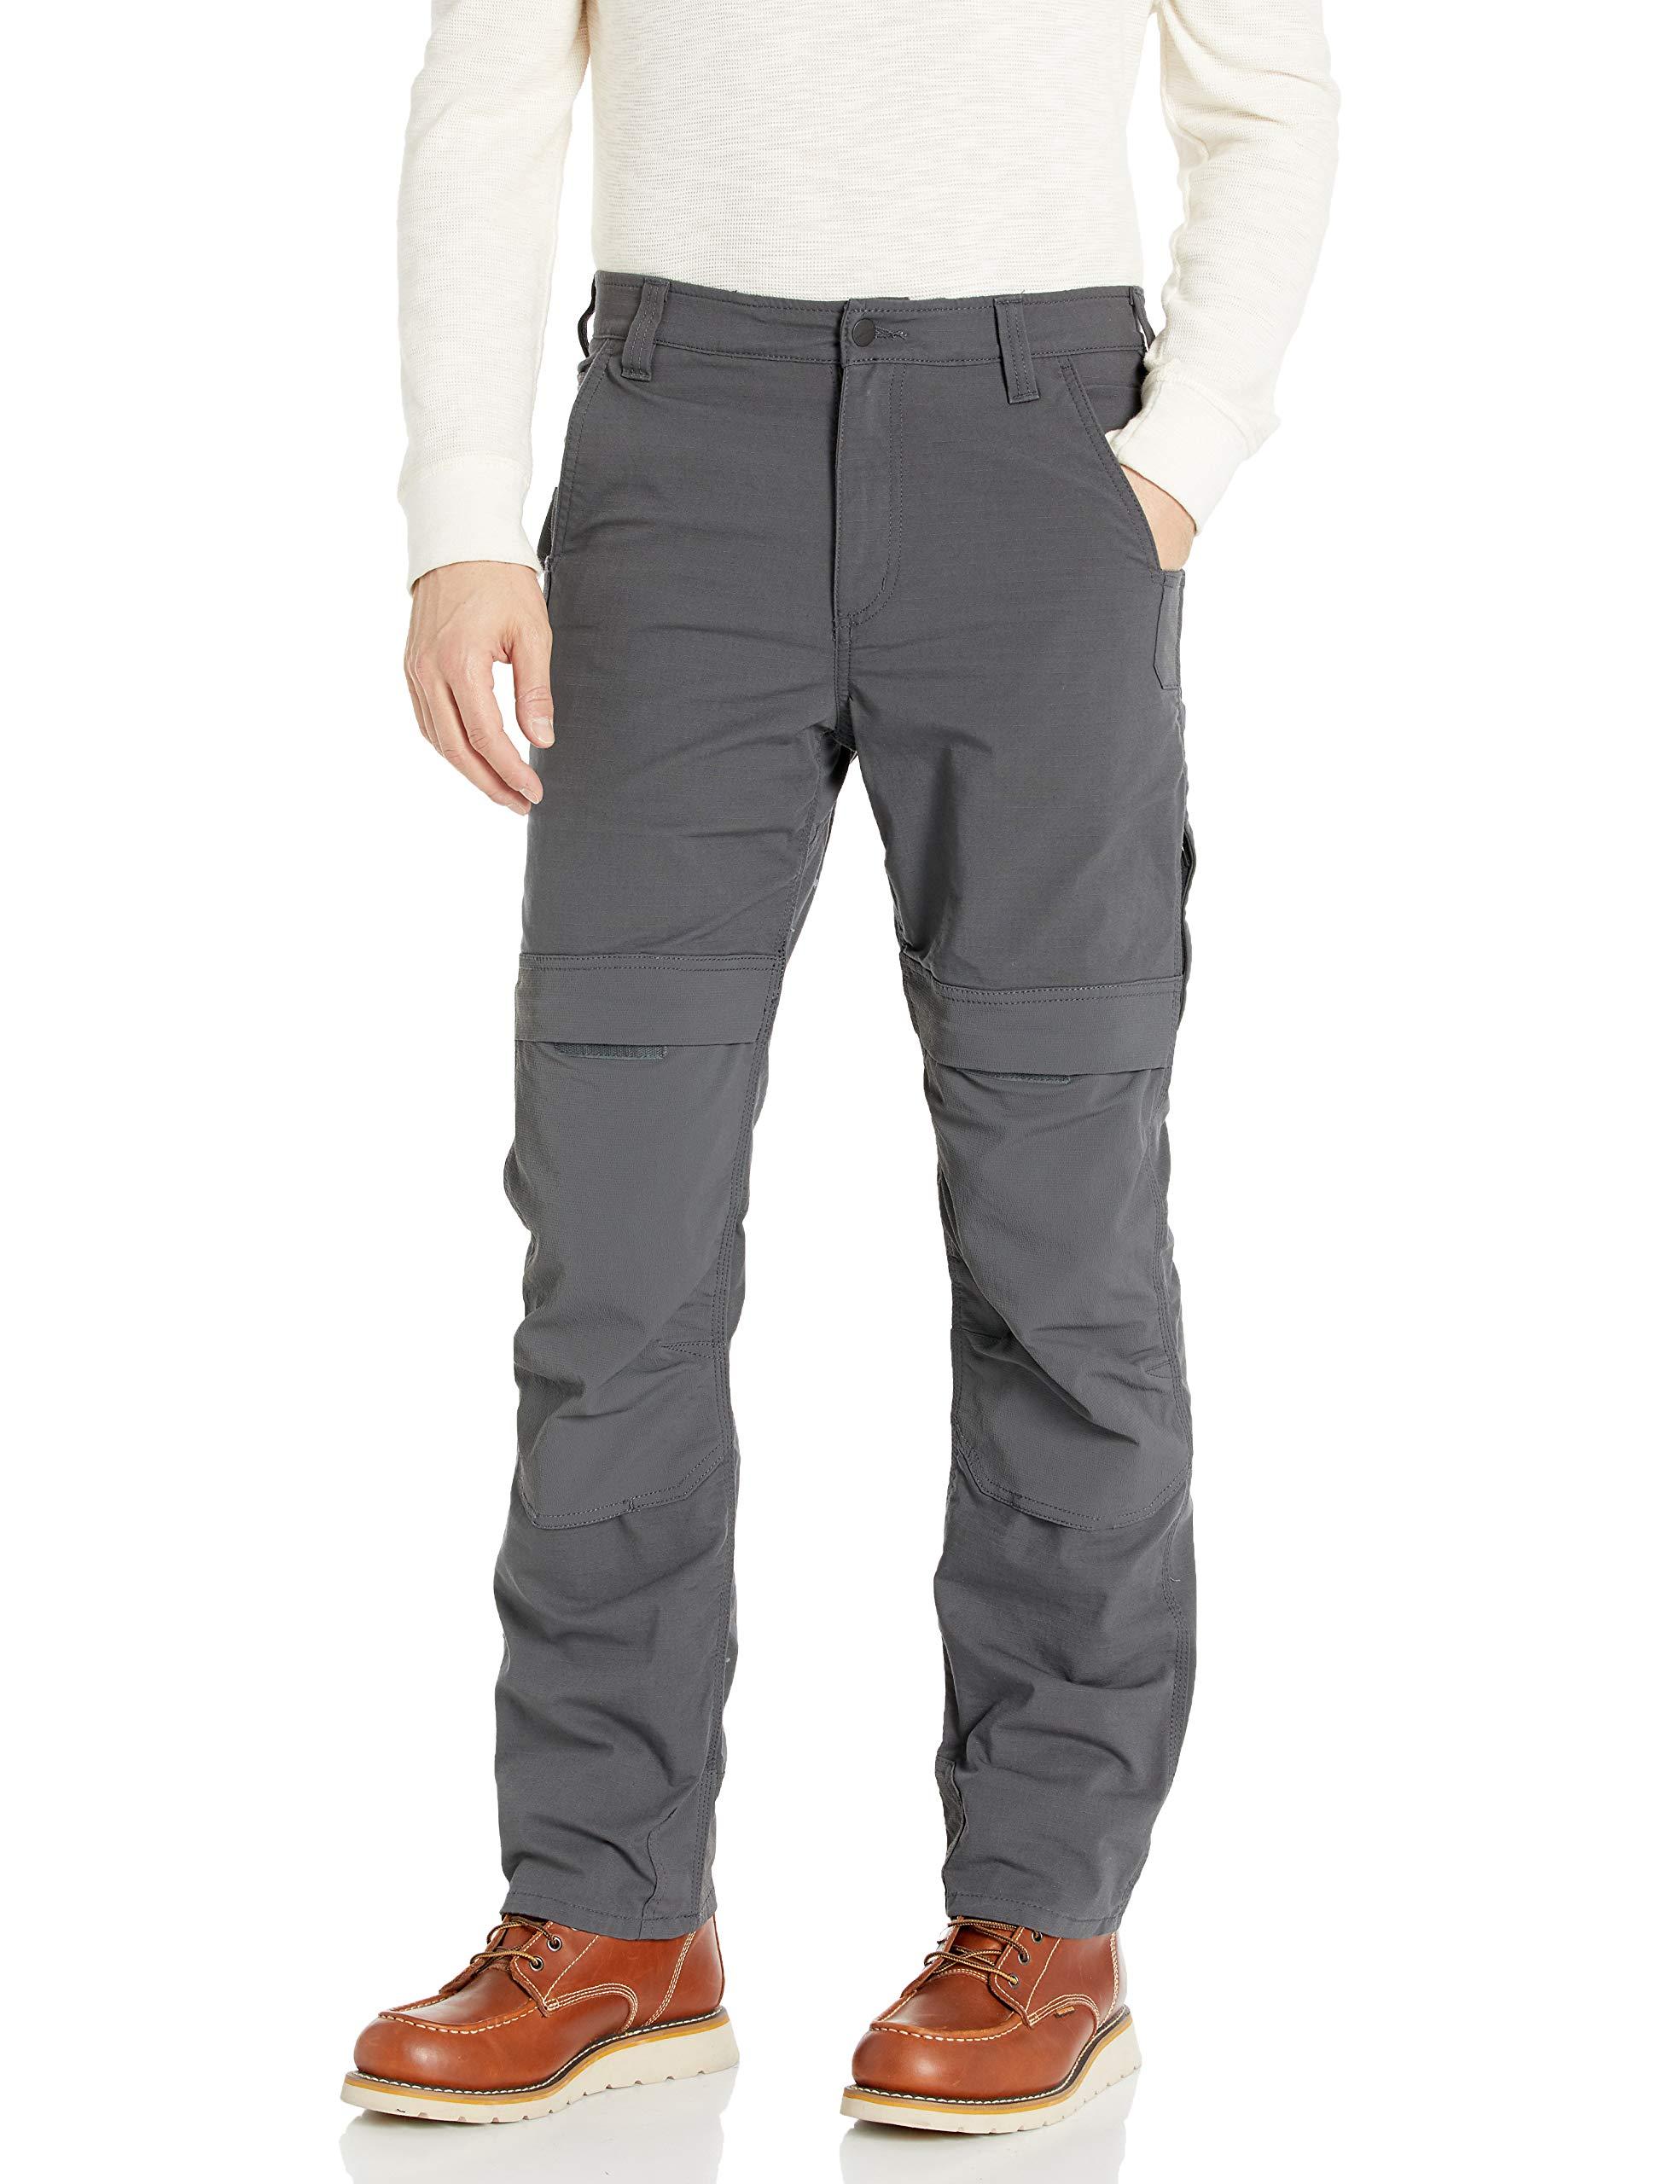 Carhartt Men's Rugged Flex Steel Multi Pocket Pant